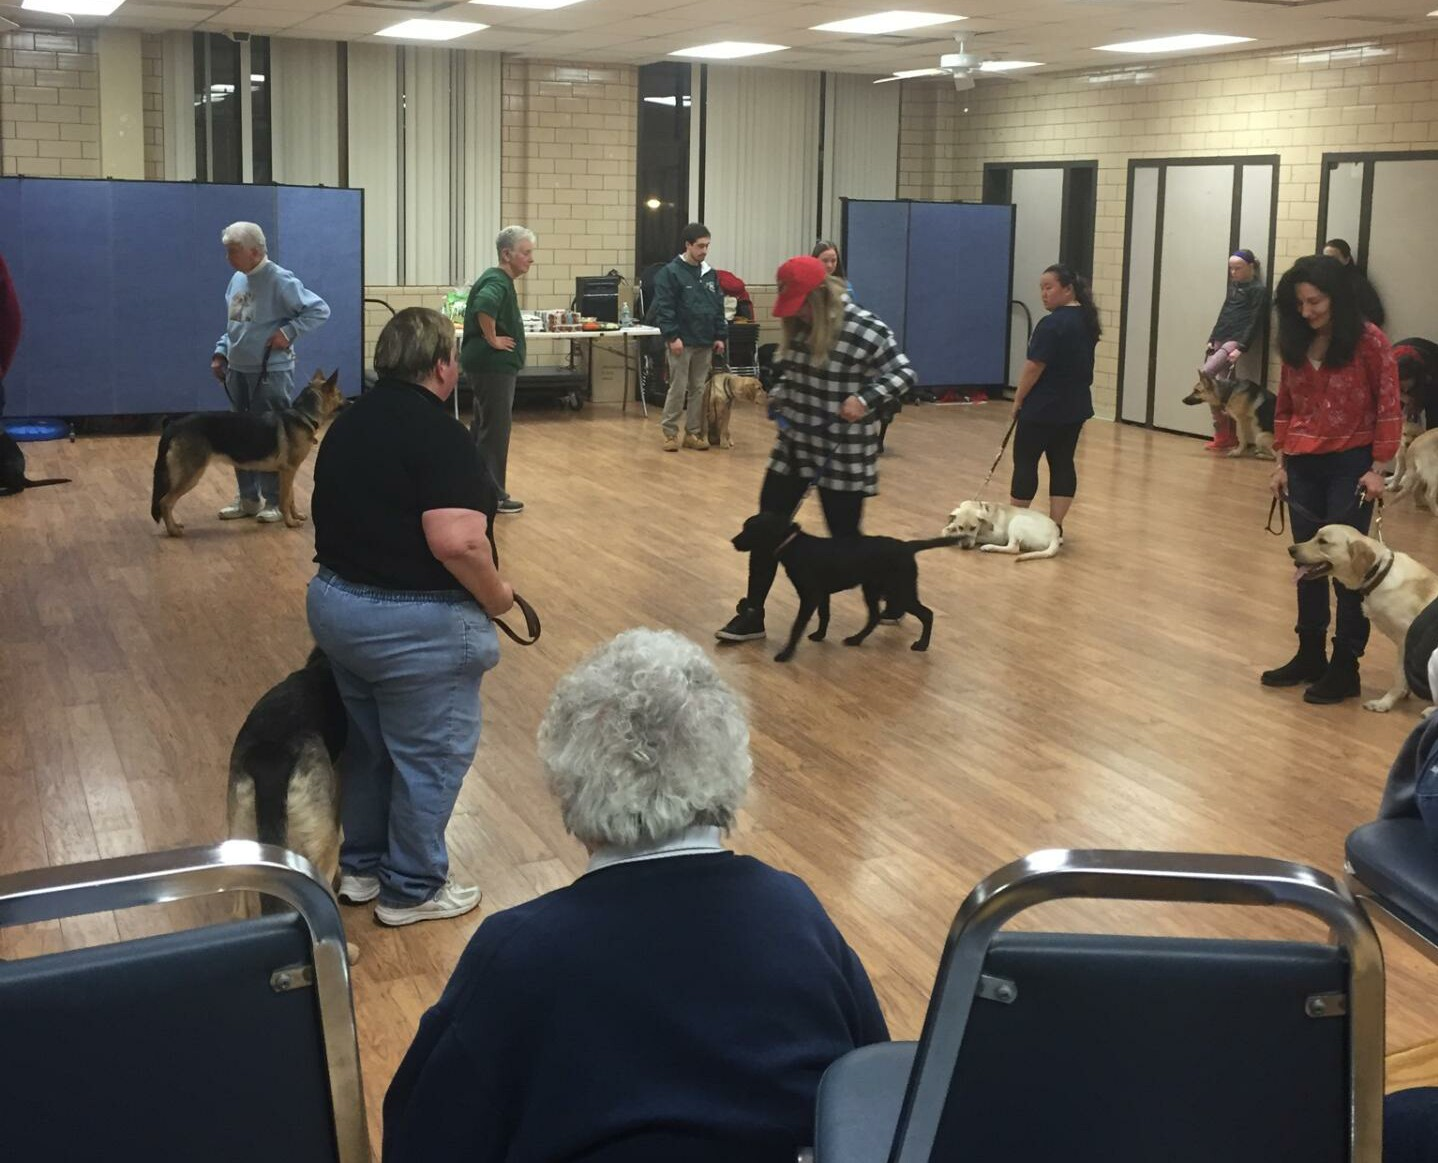 3d17430a7a8aa616696c_Roseland_Borough_Hall_Multipurpose_Room_Dog_Training.jpg